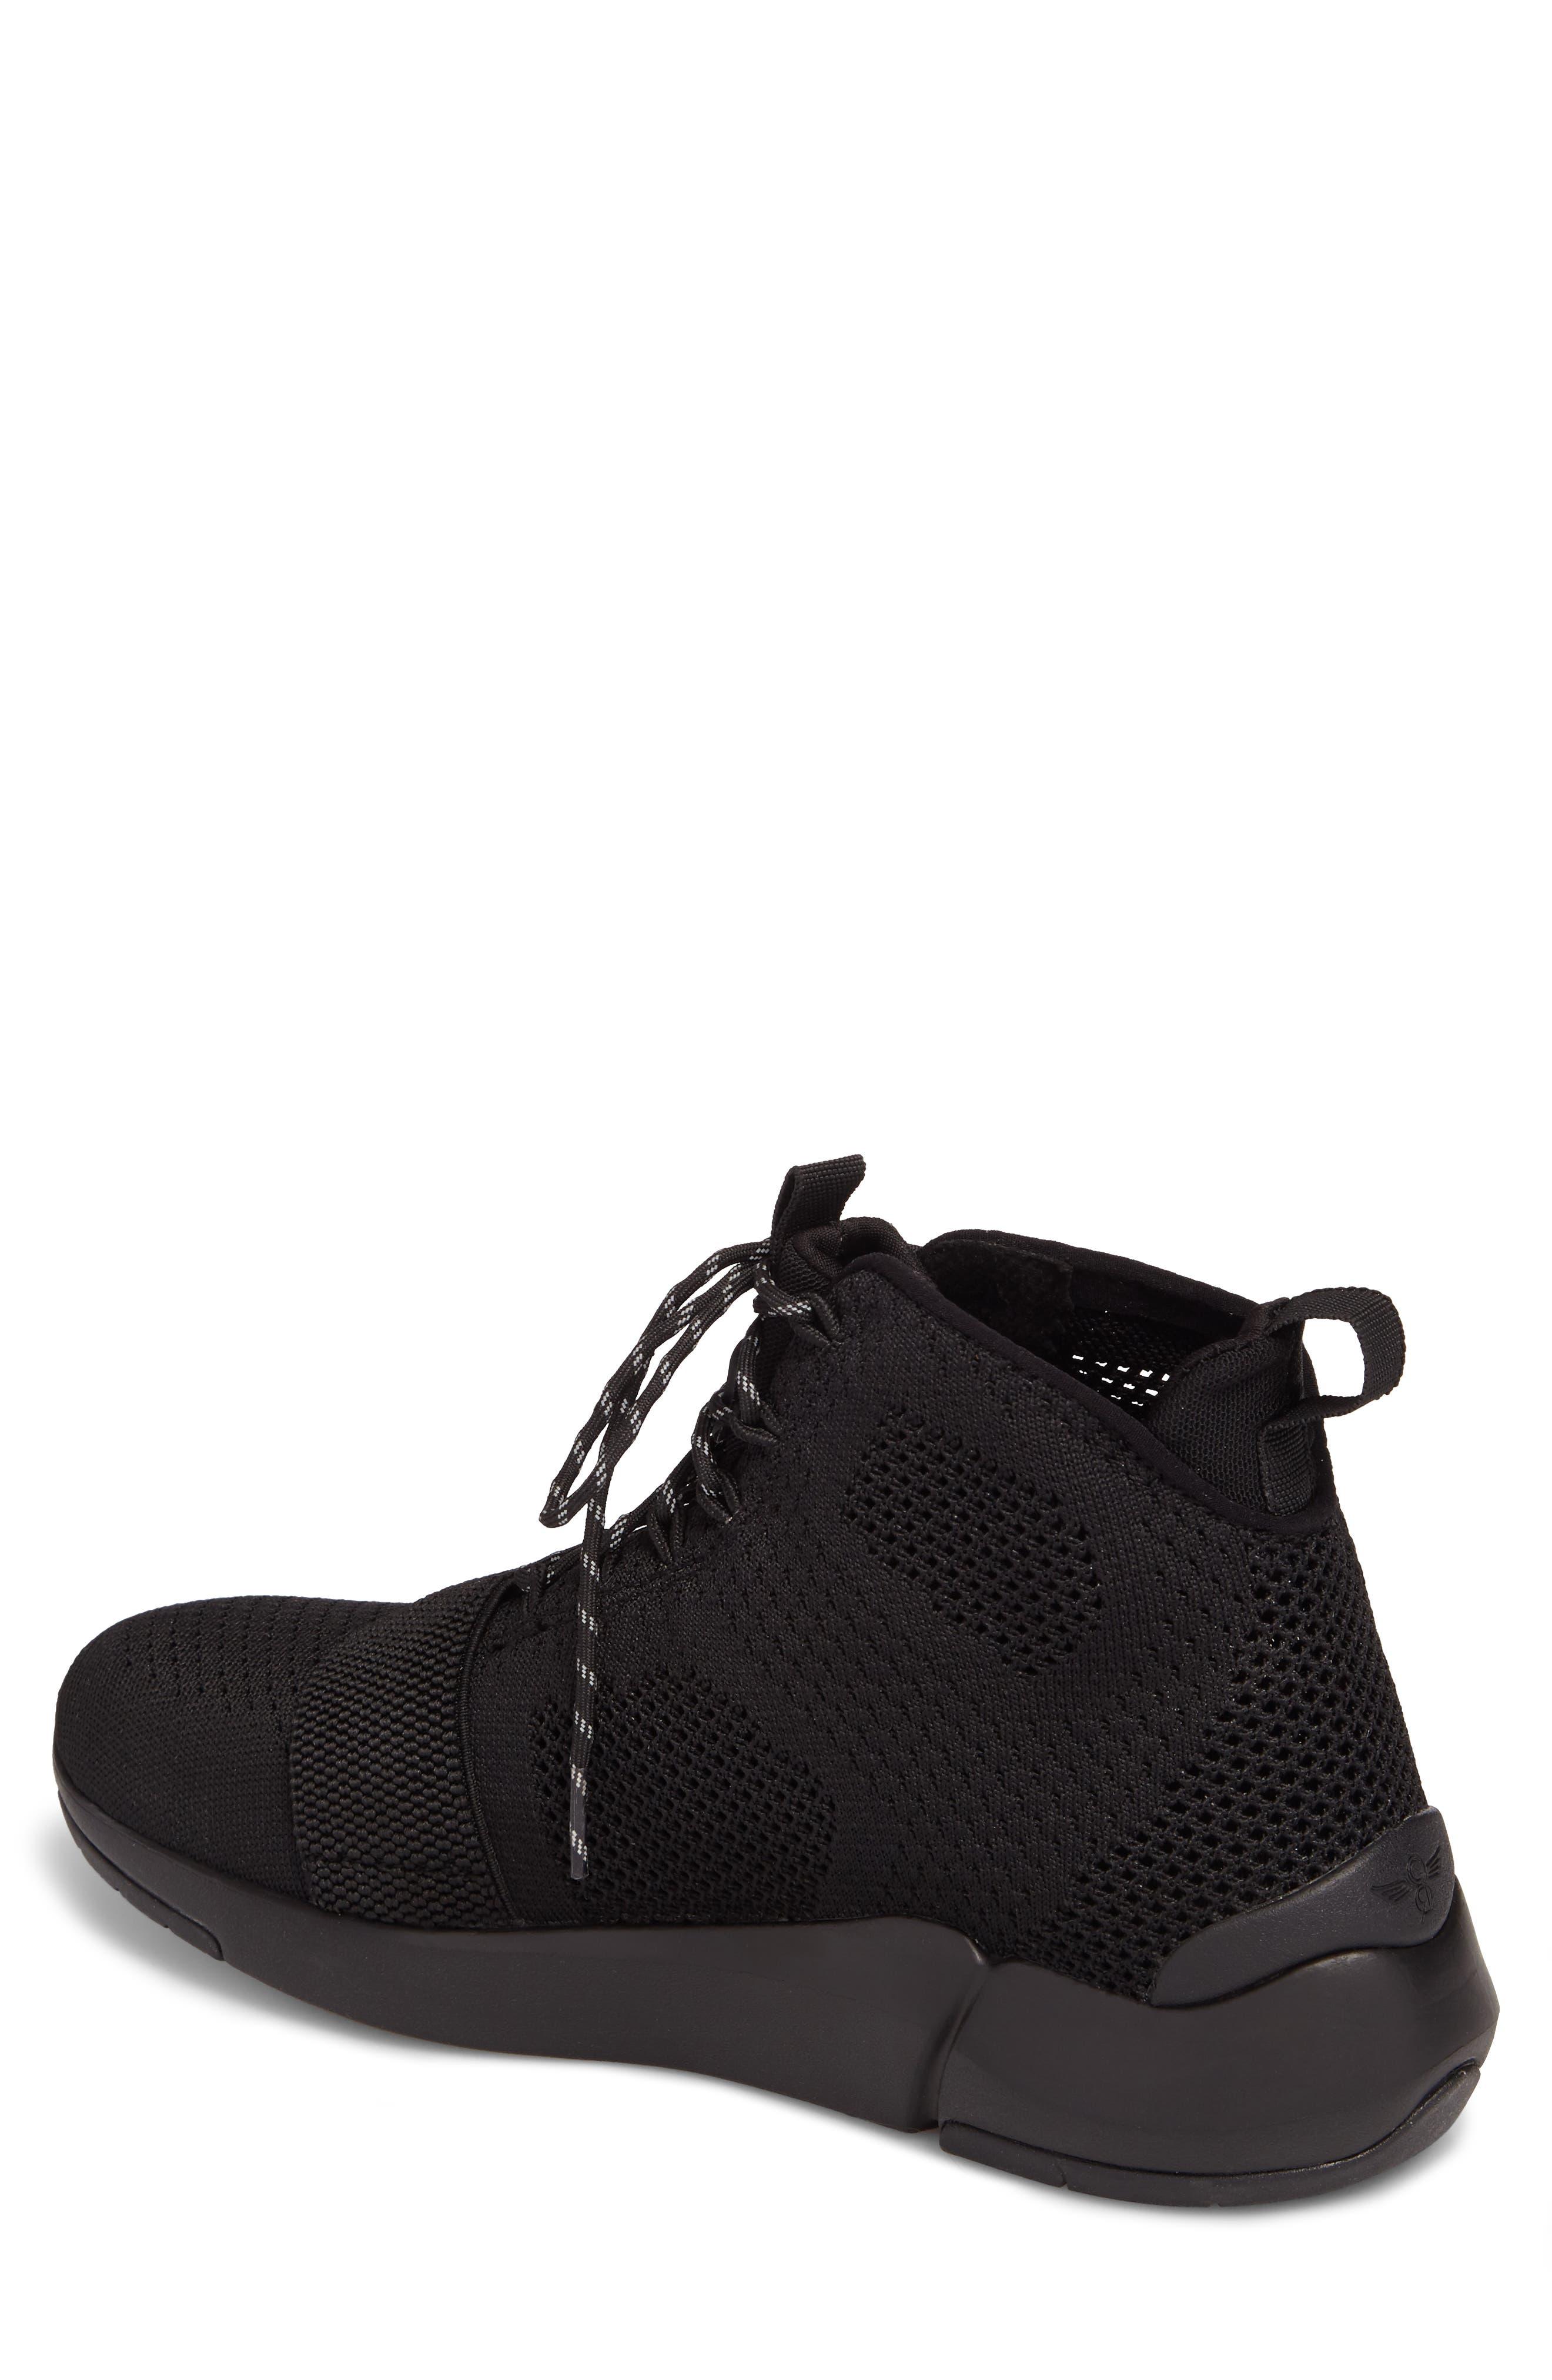 Alternate Image 2  - Creative Recreation Modica Sneaker (Men)